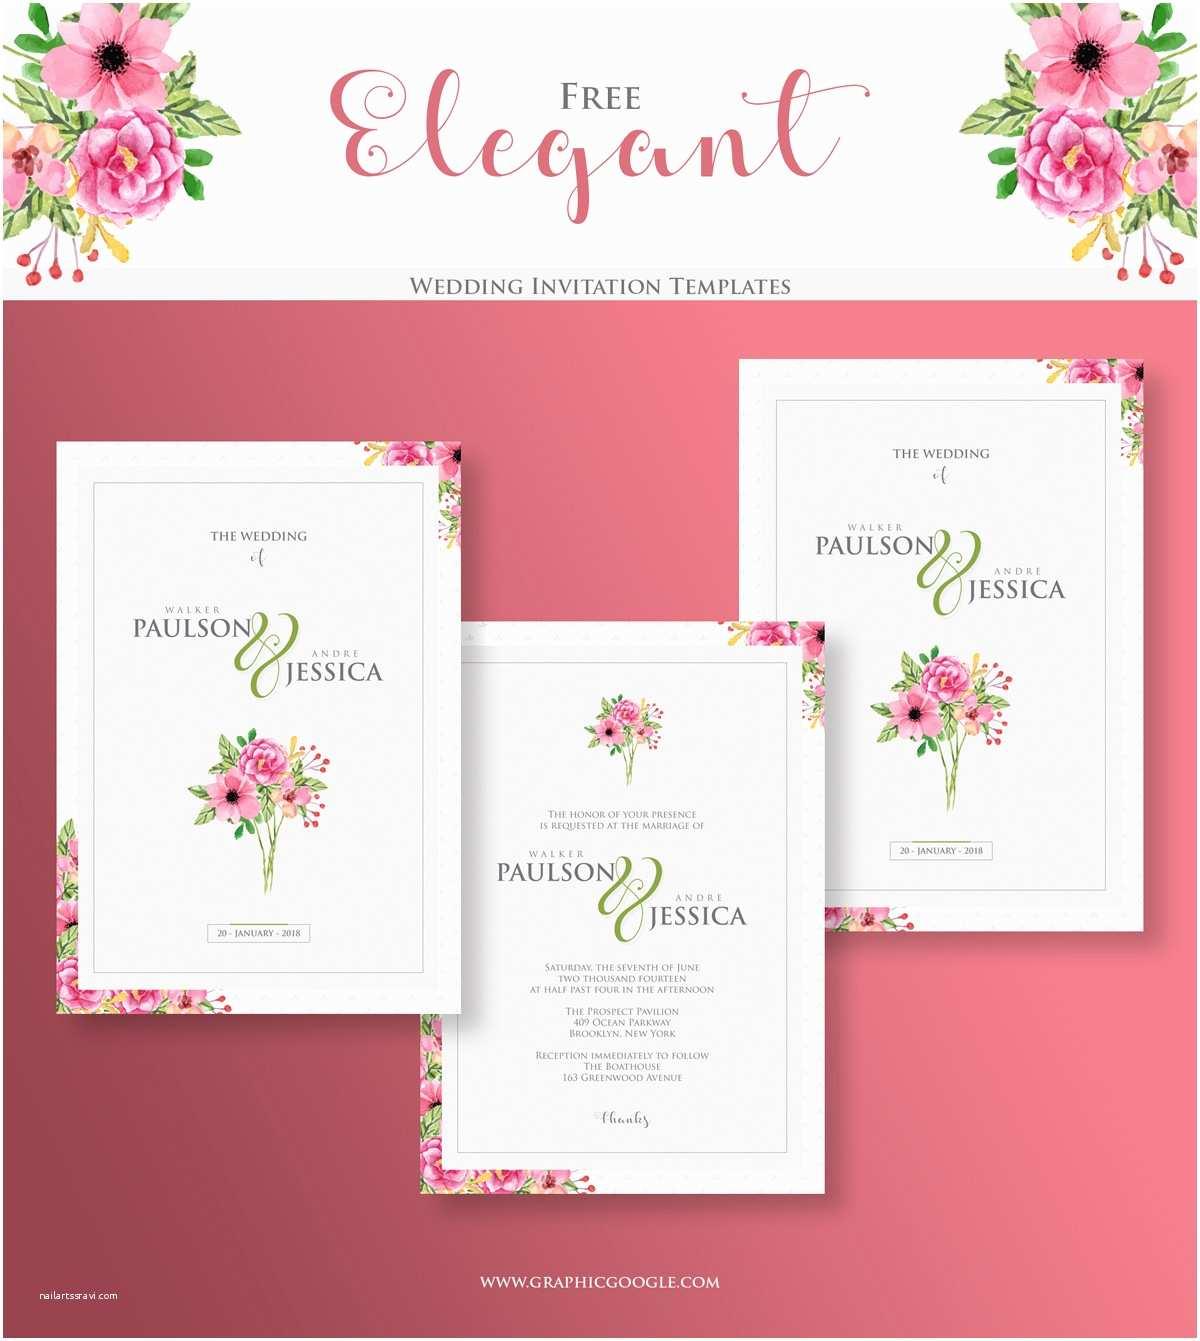 Free Wedding Invitation Samples Free Elegant Wedding Invitation Templates